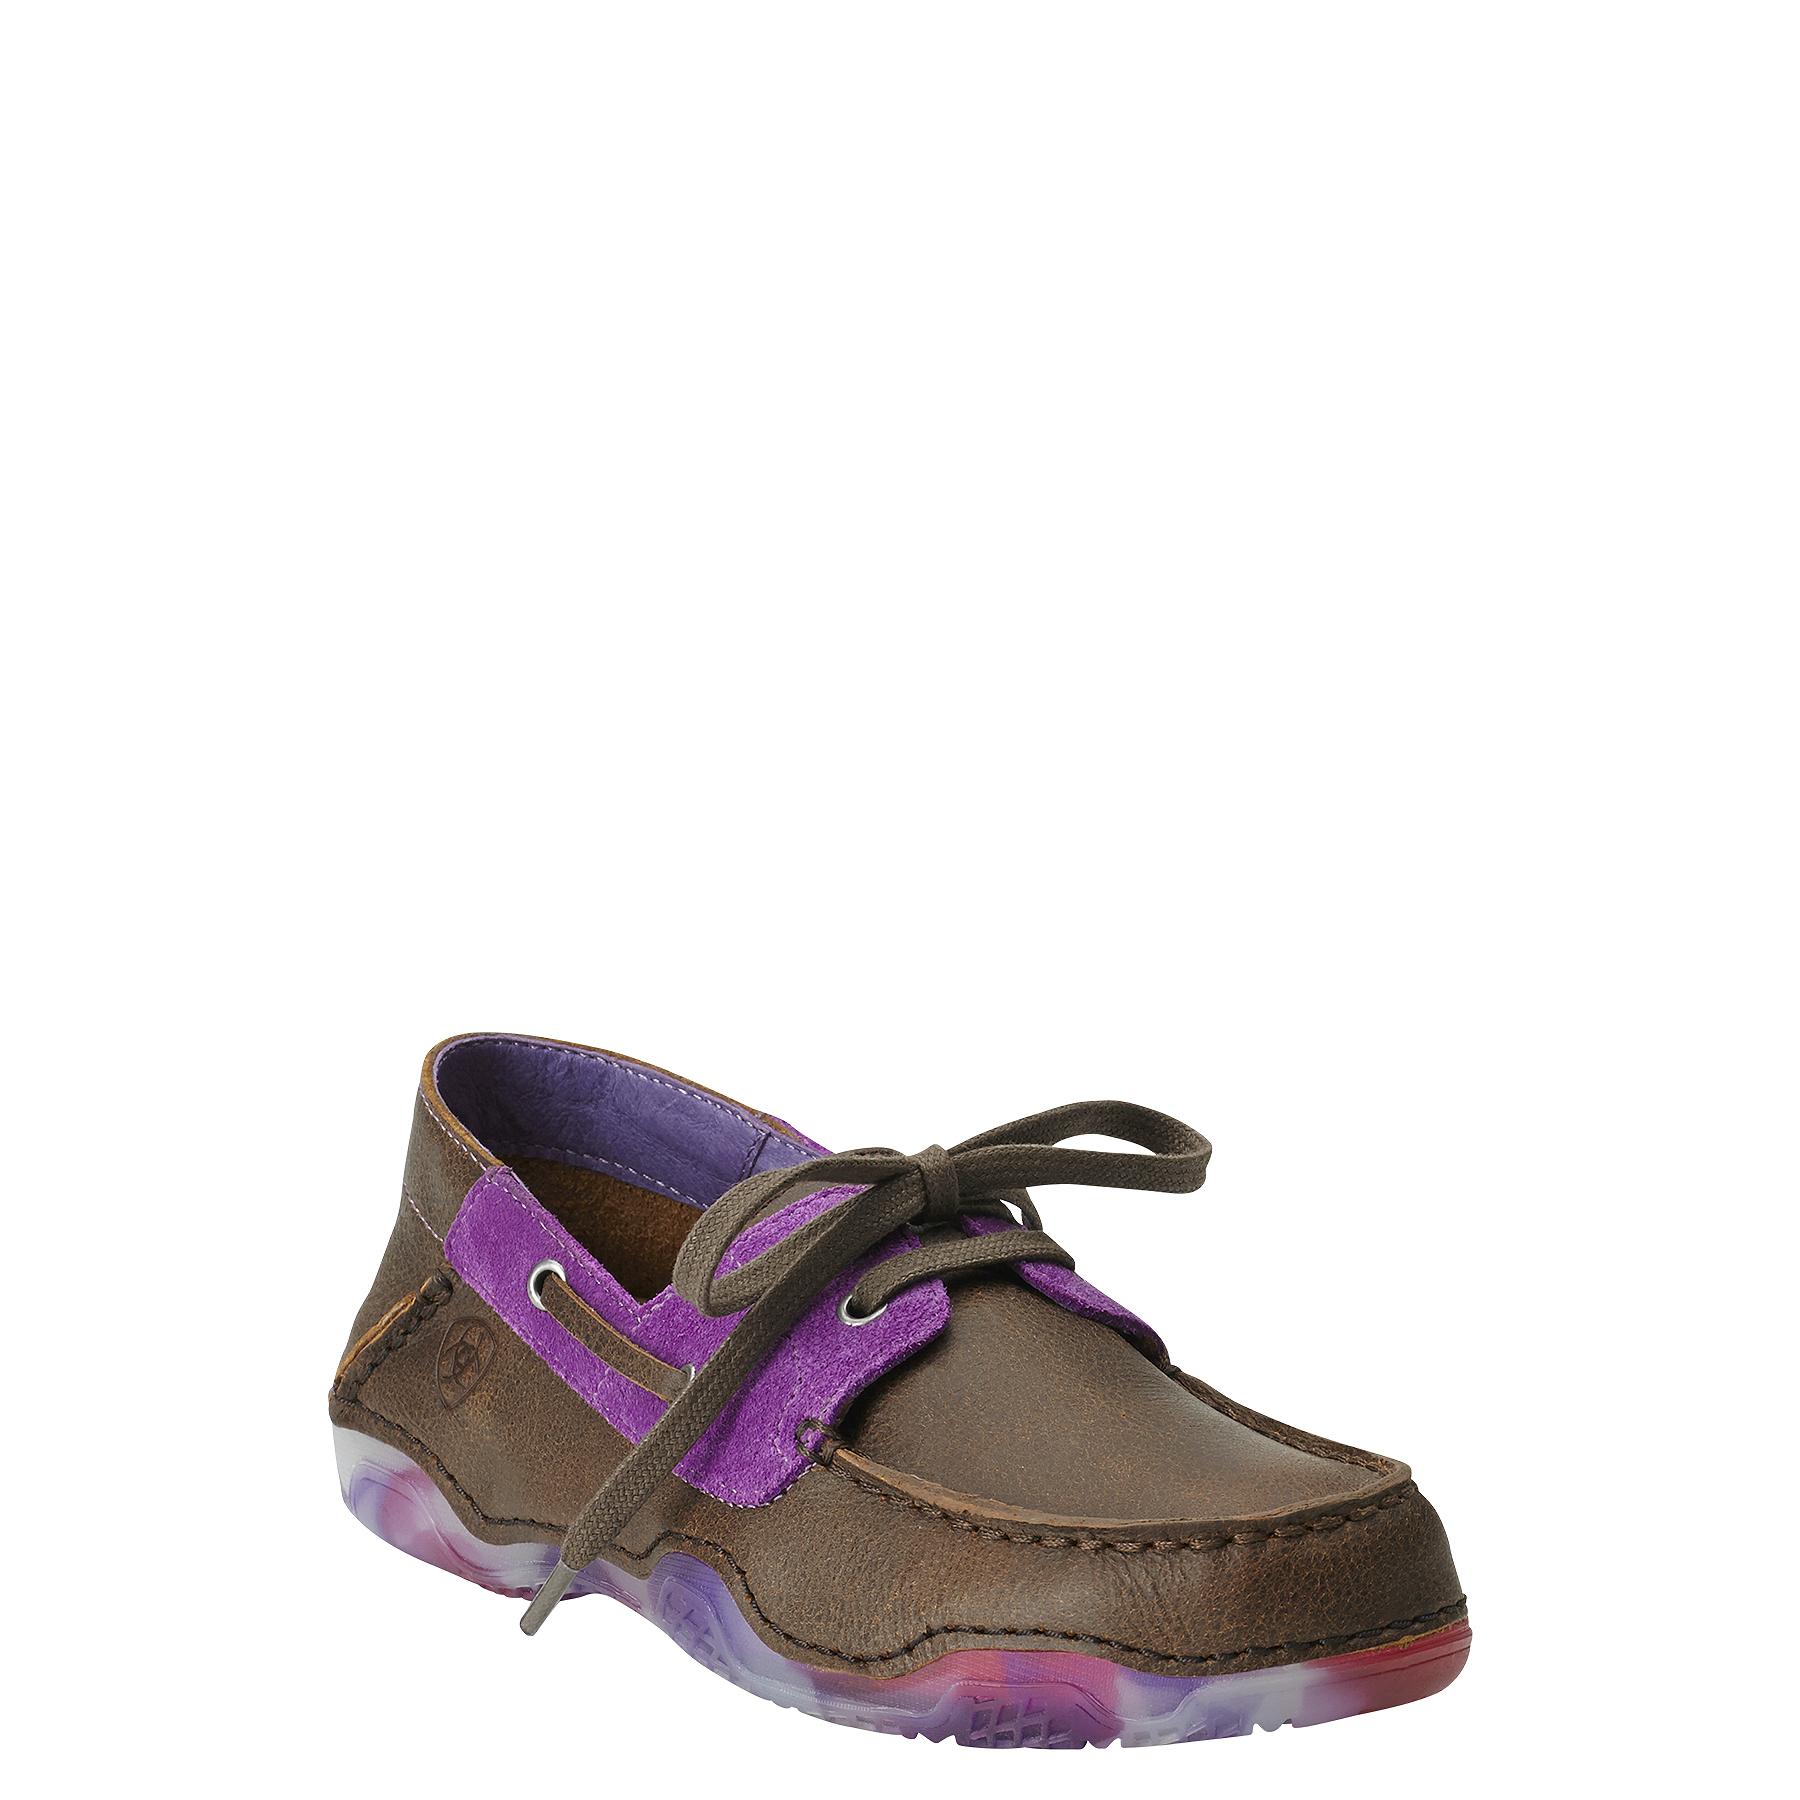 Ariat Women's Caldwell Shoe